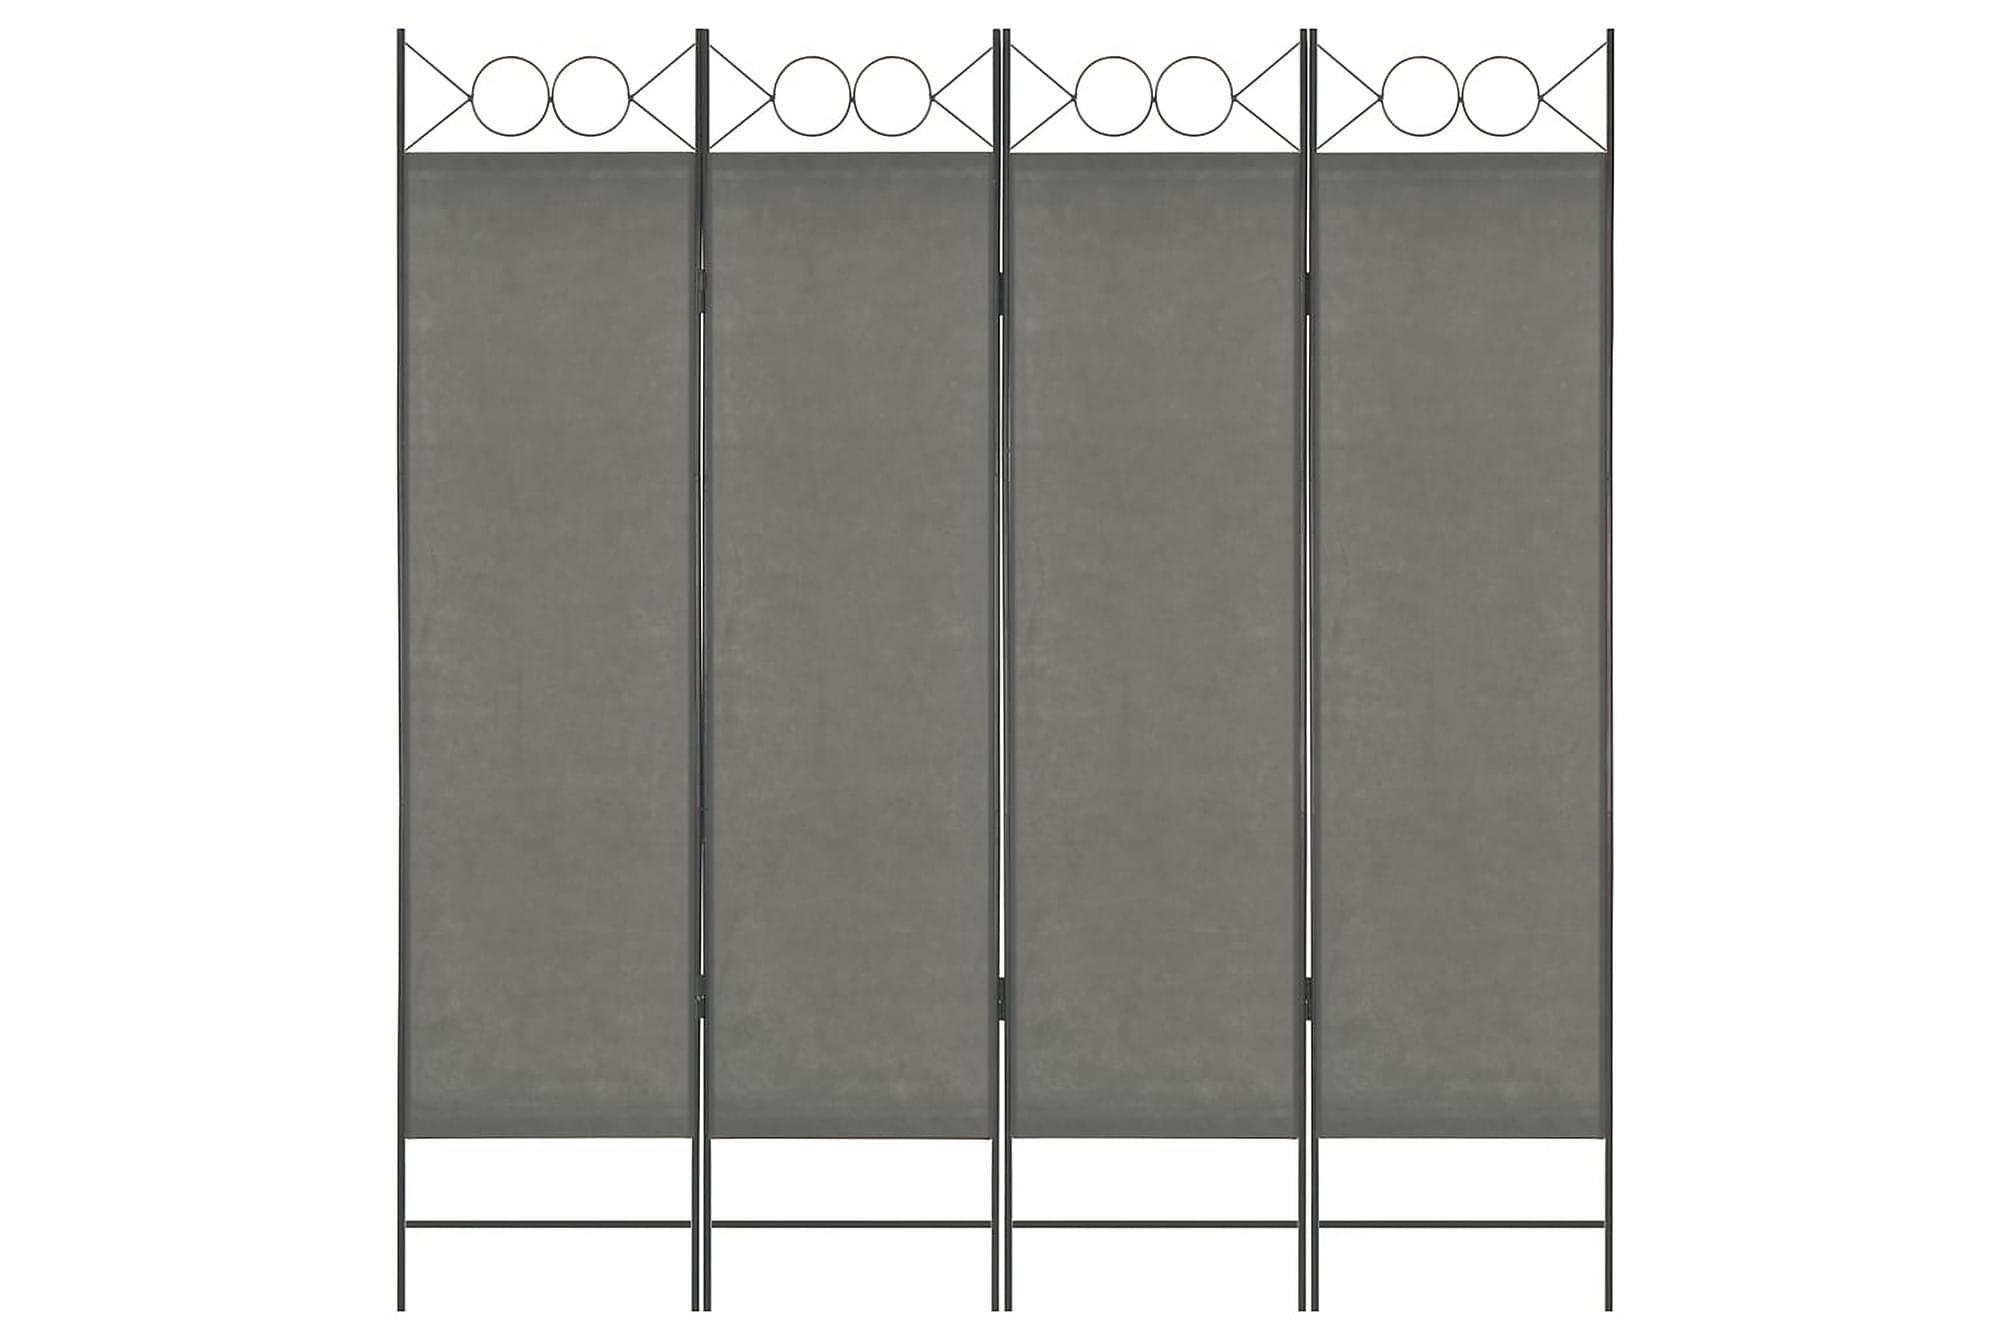 Rumsavdelare 4 paneler antracit 160×180 cm